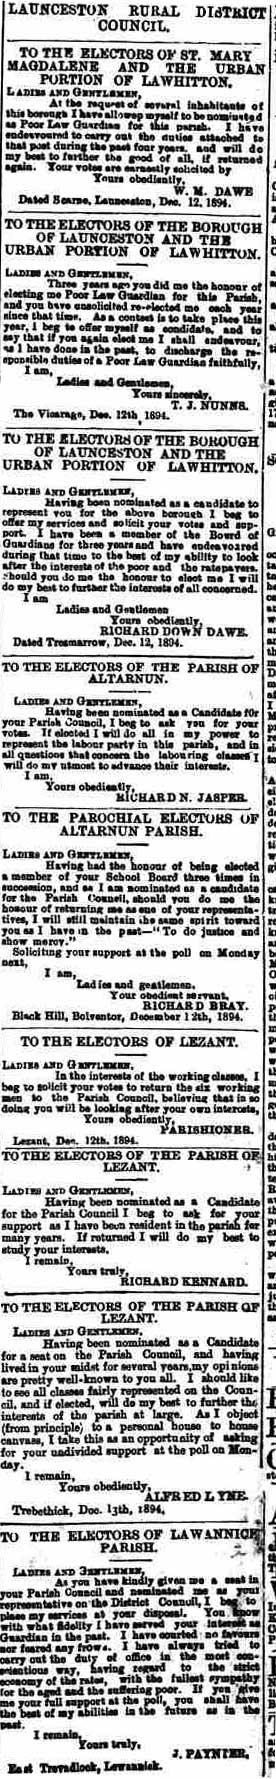 15 December 1894